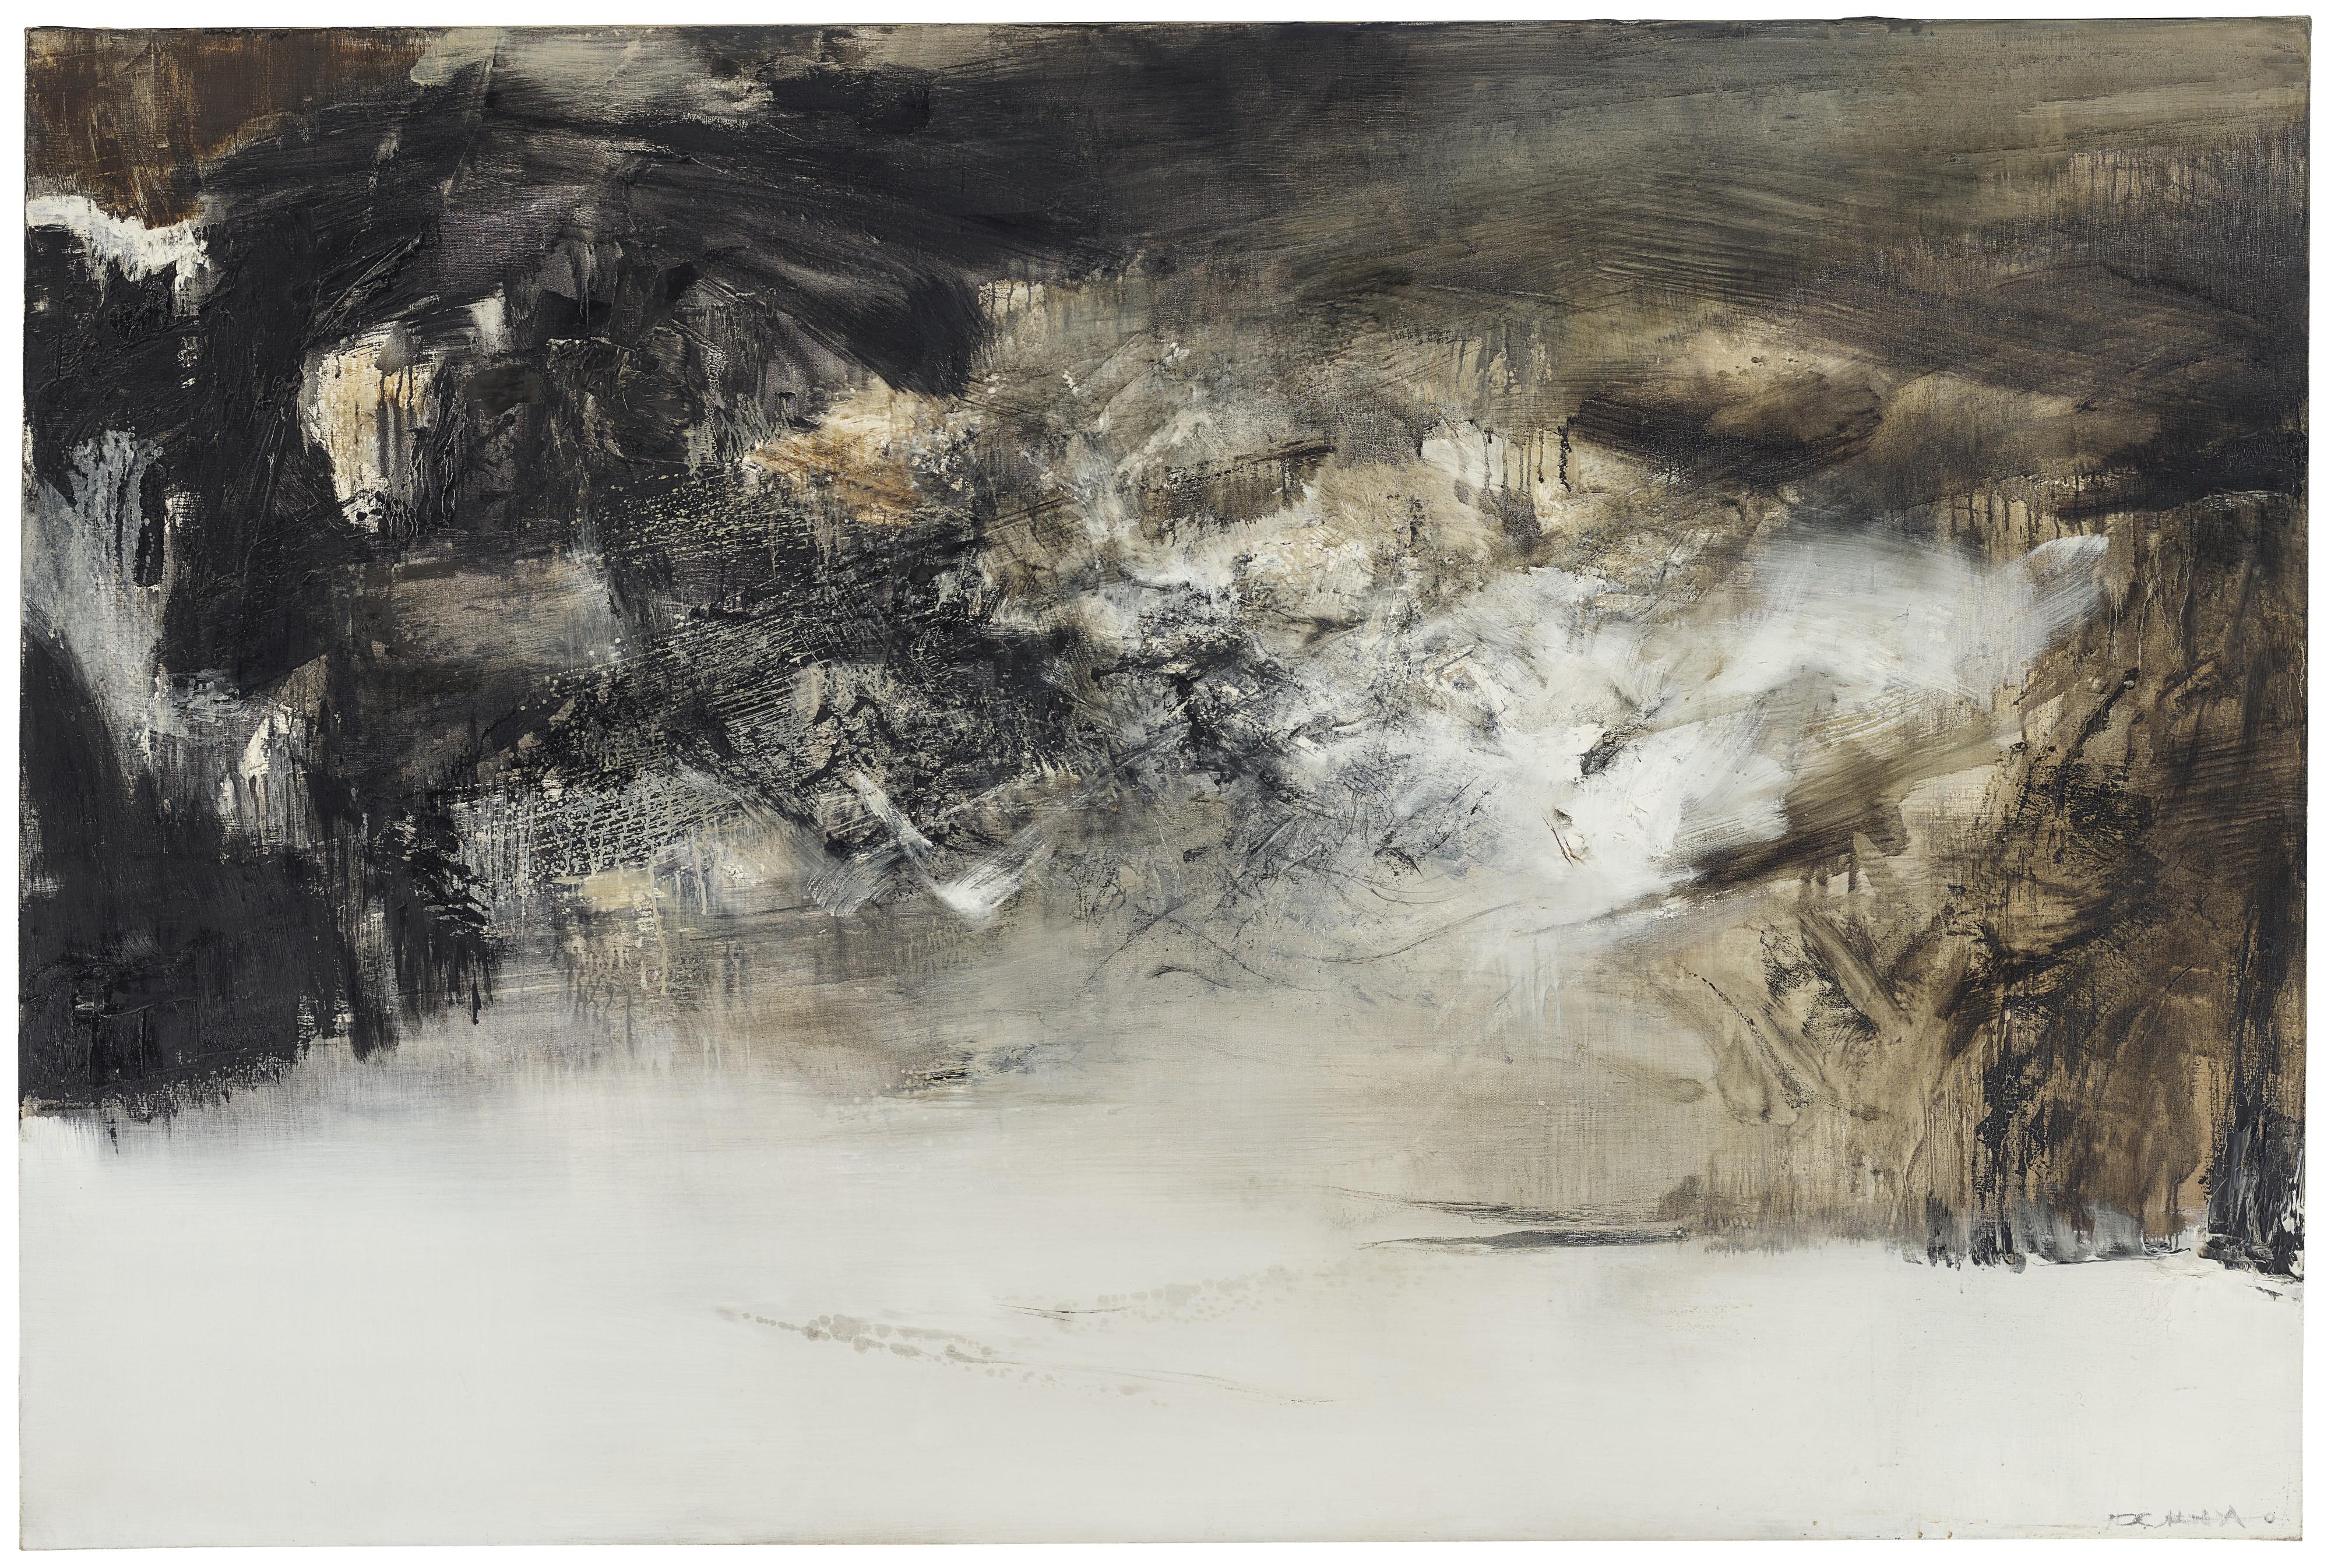 Zao Wou-Ki, 27.3.70 (1970) (courtesy of Christie's)